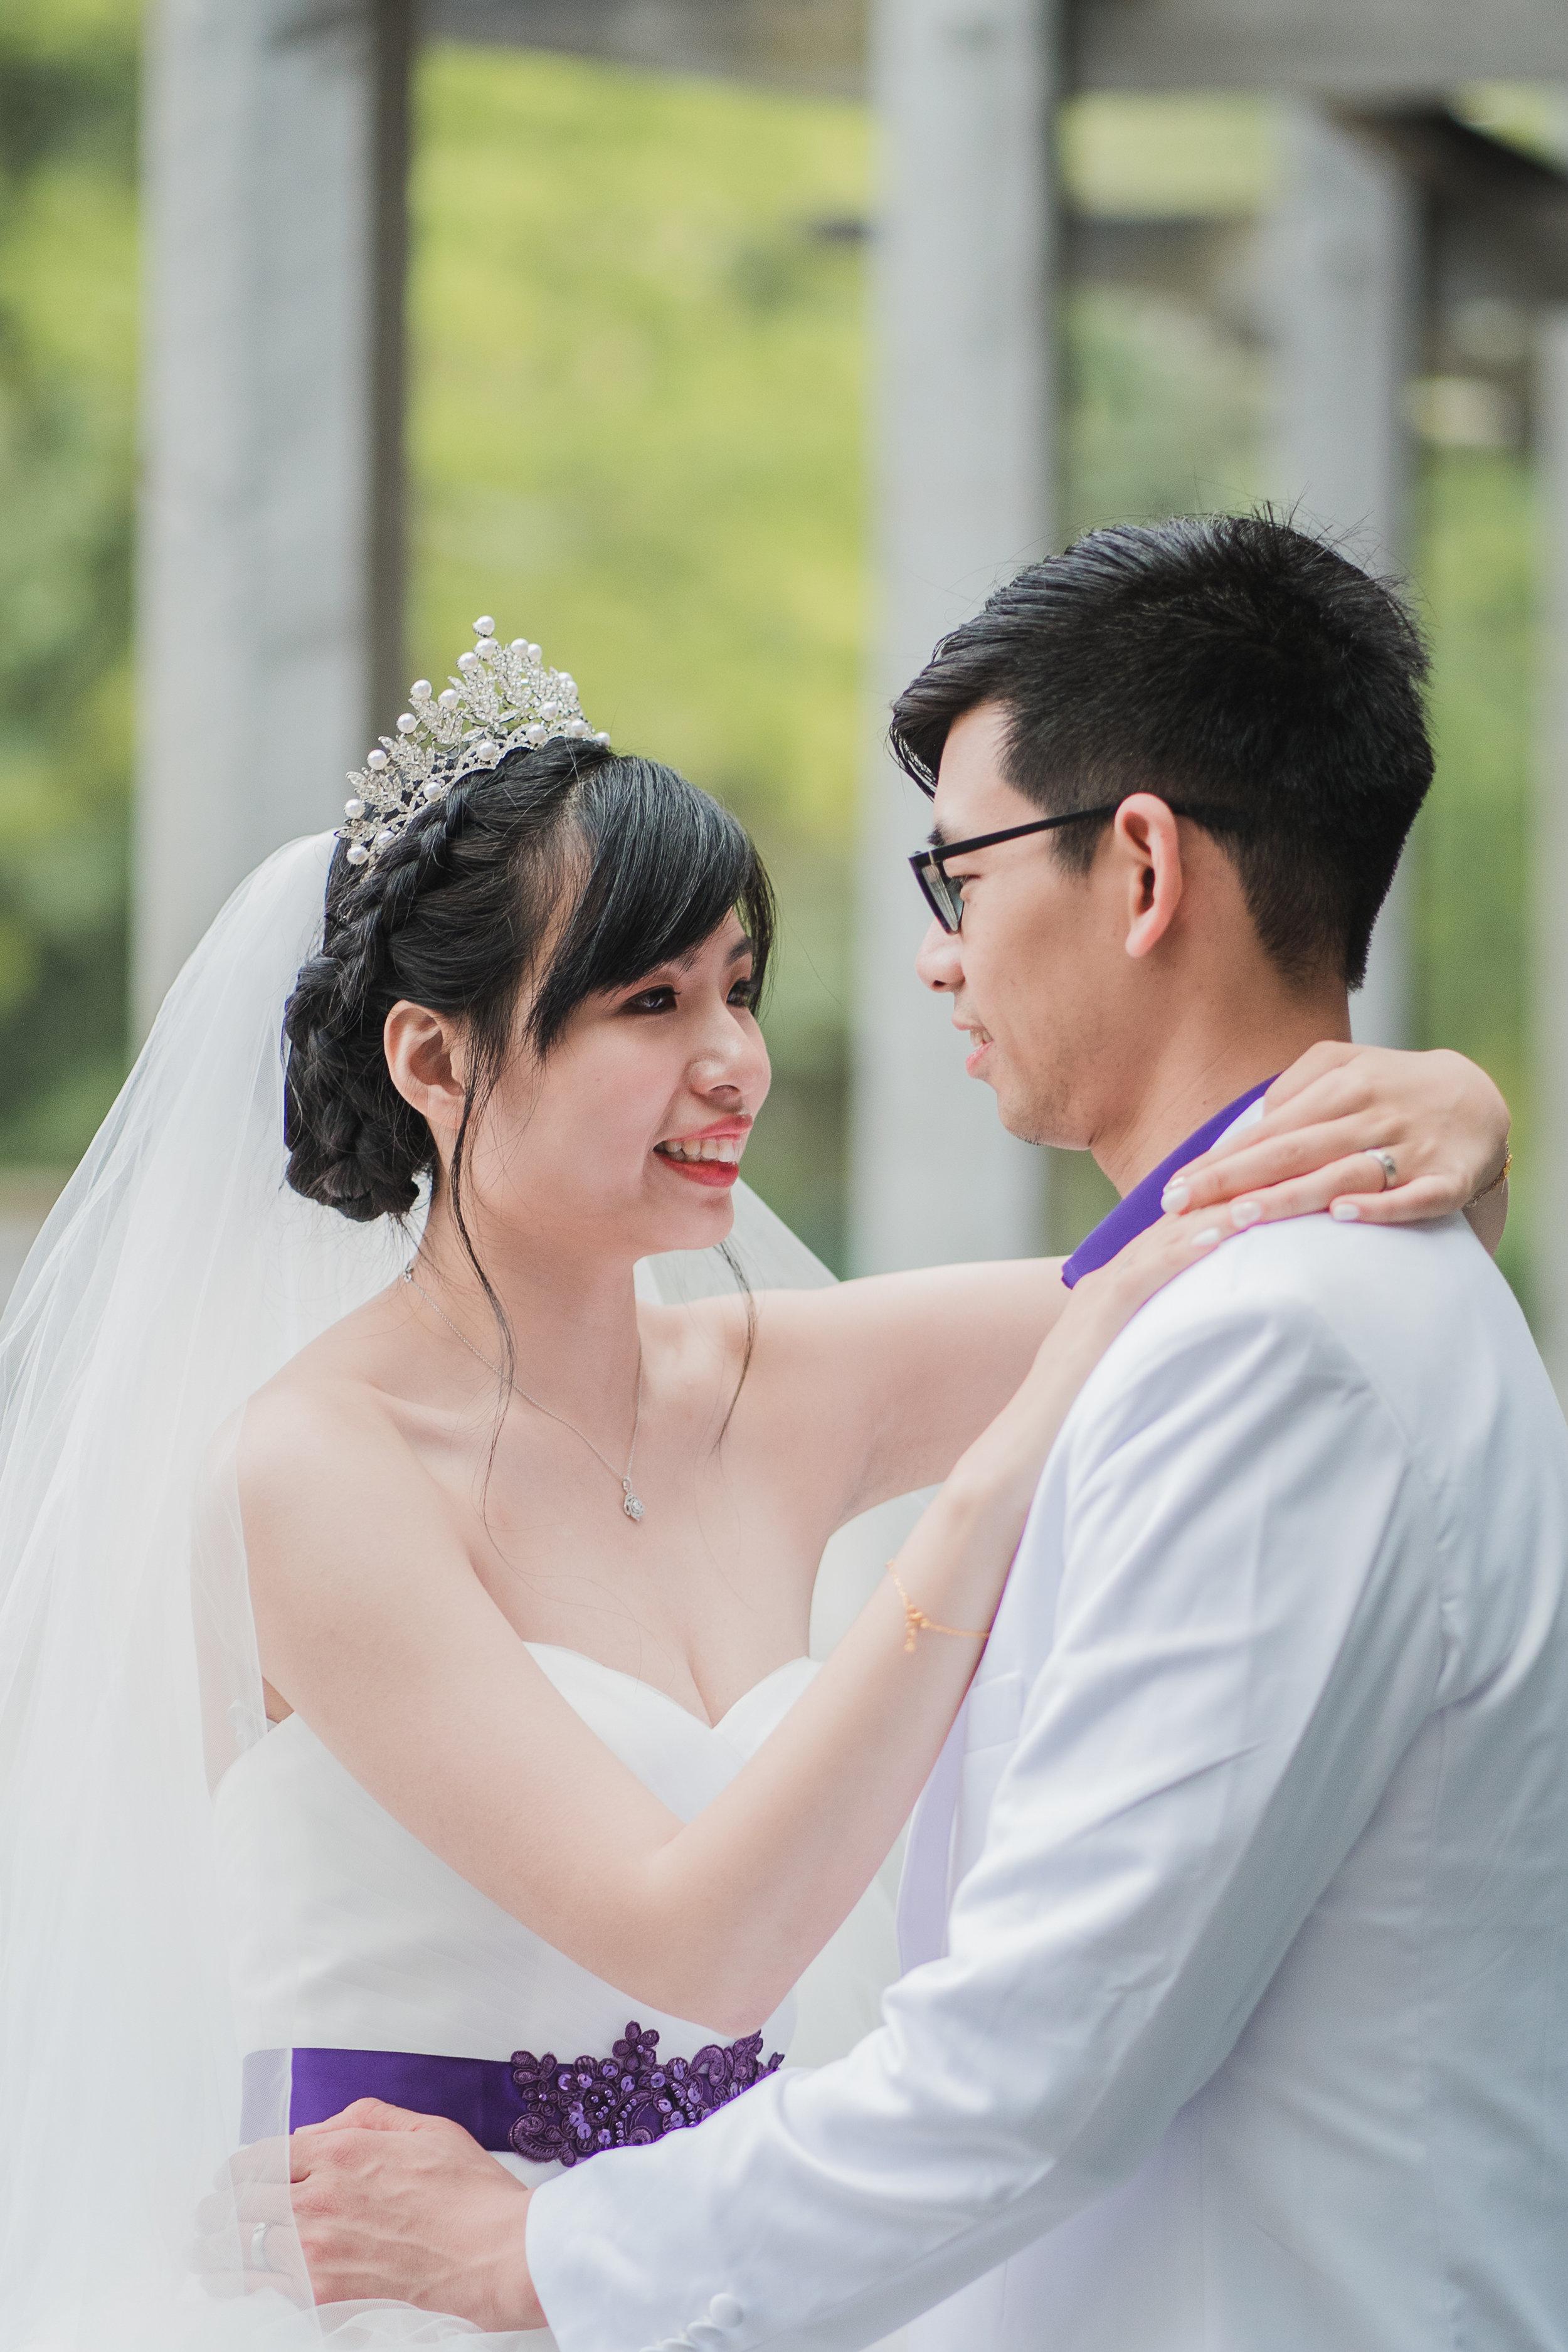 20190520 - Pamela & Matthew Wedding - 0222.jpg